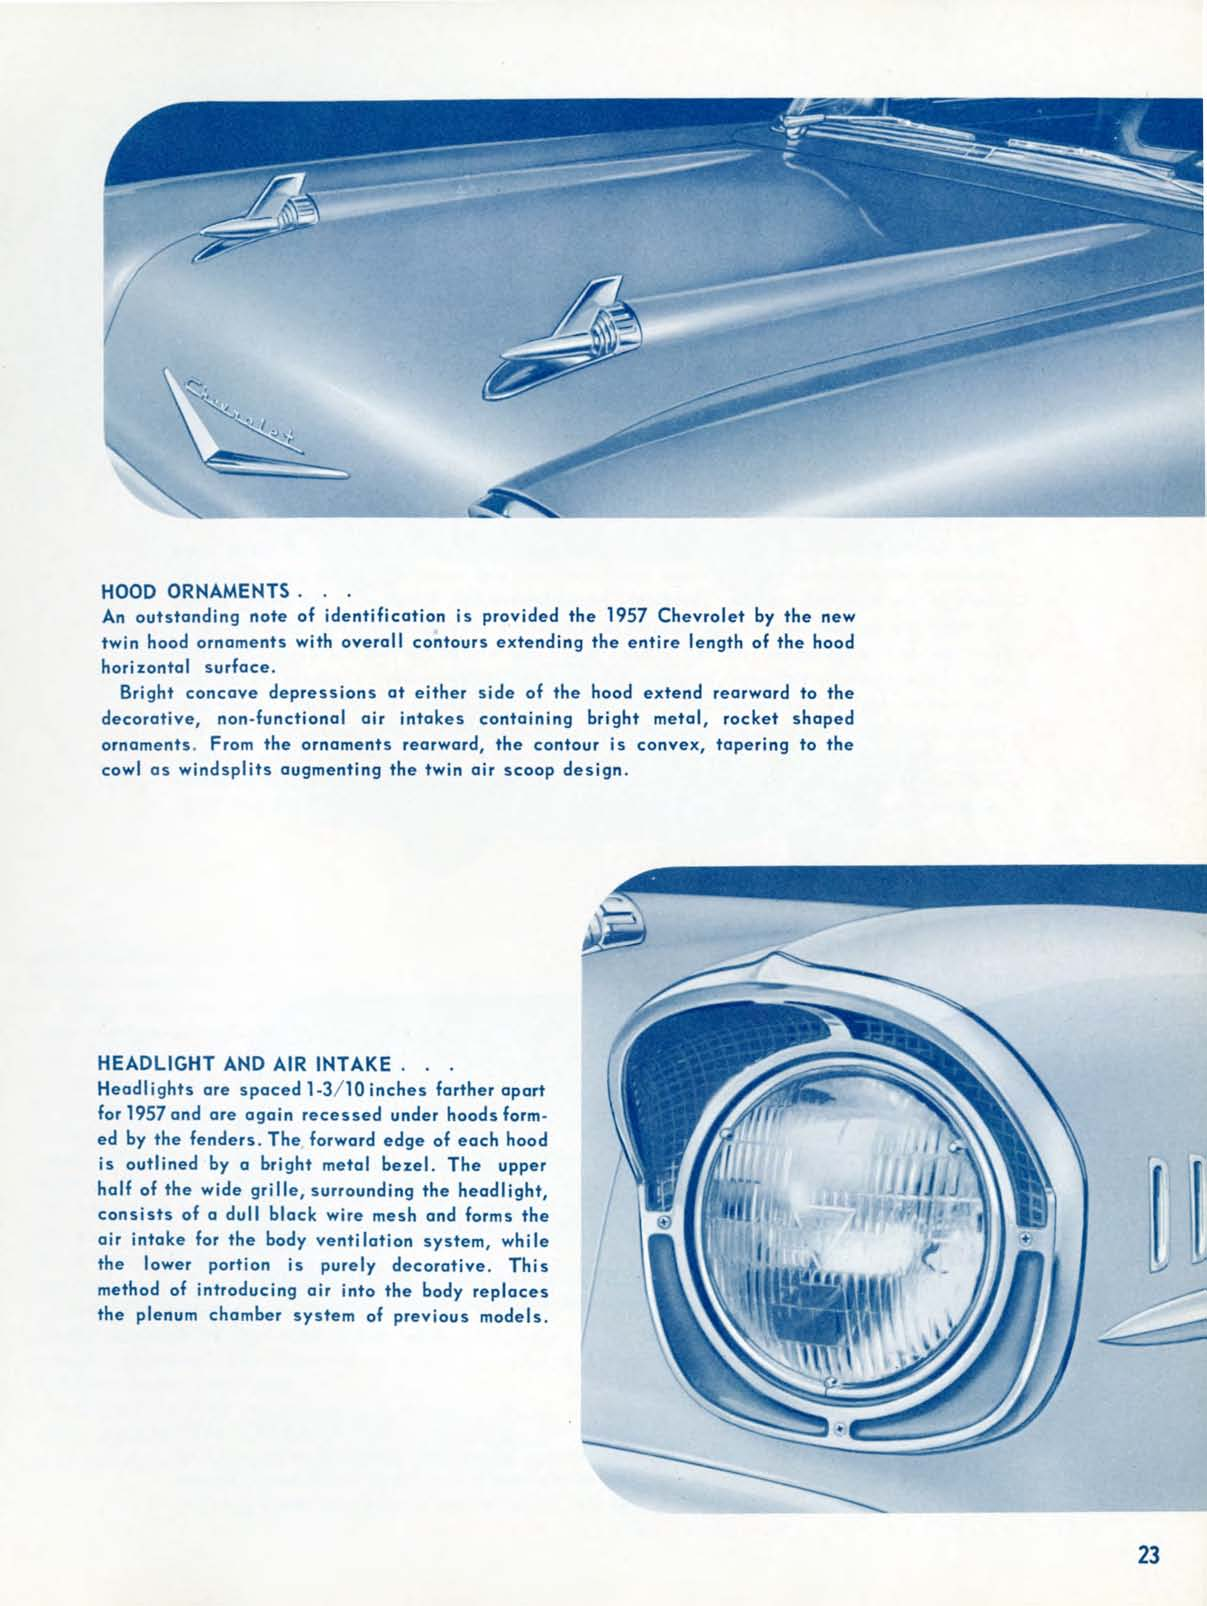 Hood Ornament Identification : ornament, identification, Chevrolet, Engineering, Features, Brochure